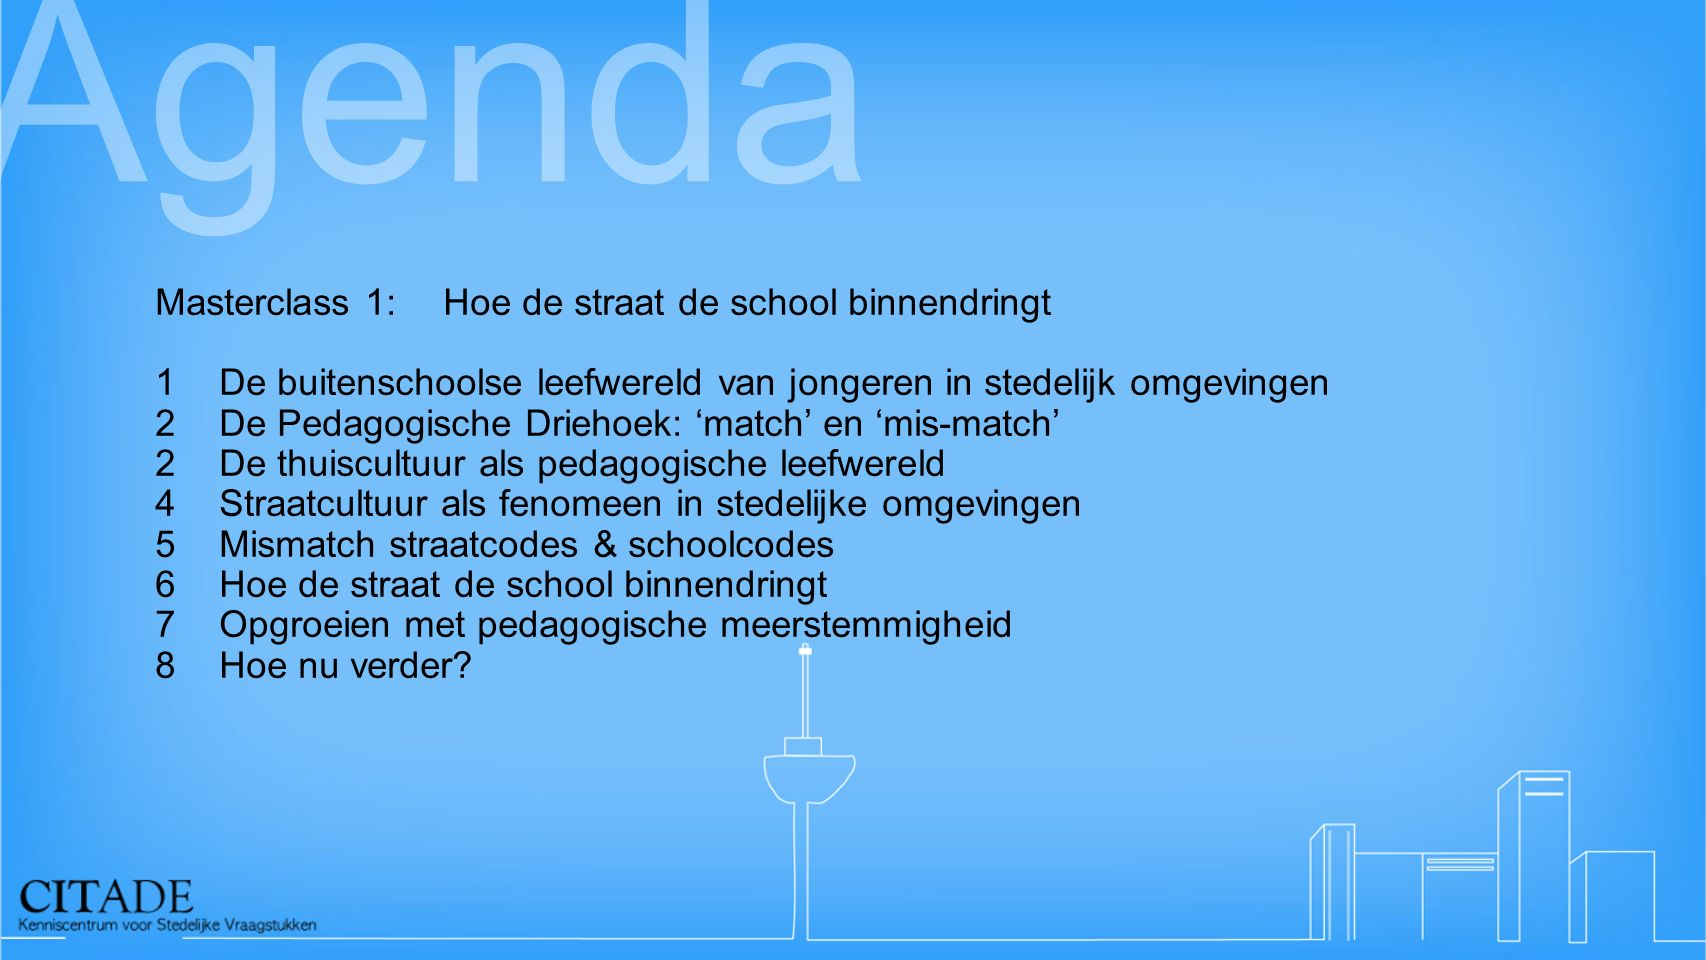 Agenda Masterclass 1: Hoe de straat de school binnendringt